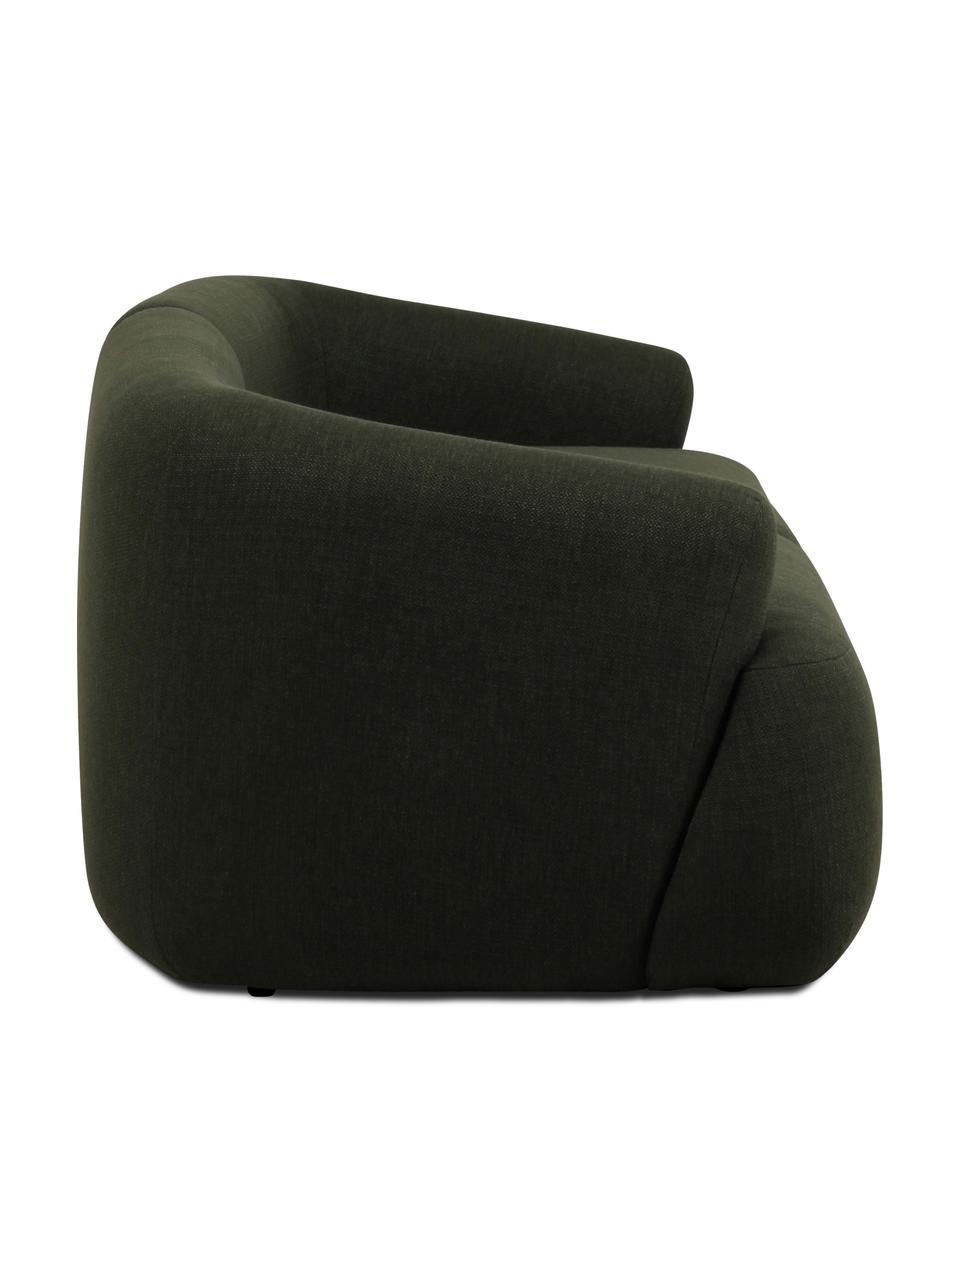 Modulares Sofa Sofia (2-Sitzer) in Grün, Bezug: 100% Polypropylen Der hoc, Gestell: Massives Kiefernholz, Spa, Füße: Kunststoff, Webstoff Grün, B 192 x T 95 cm